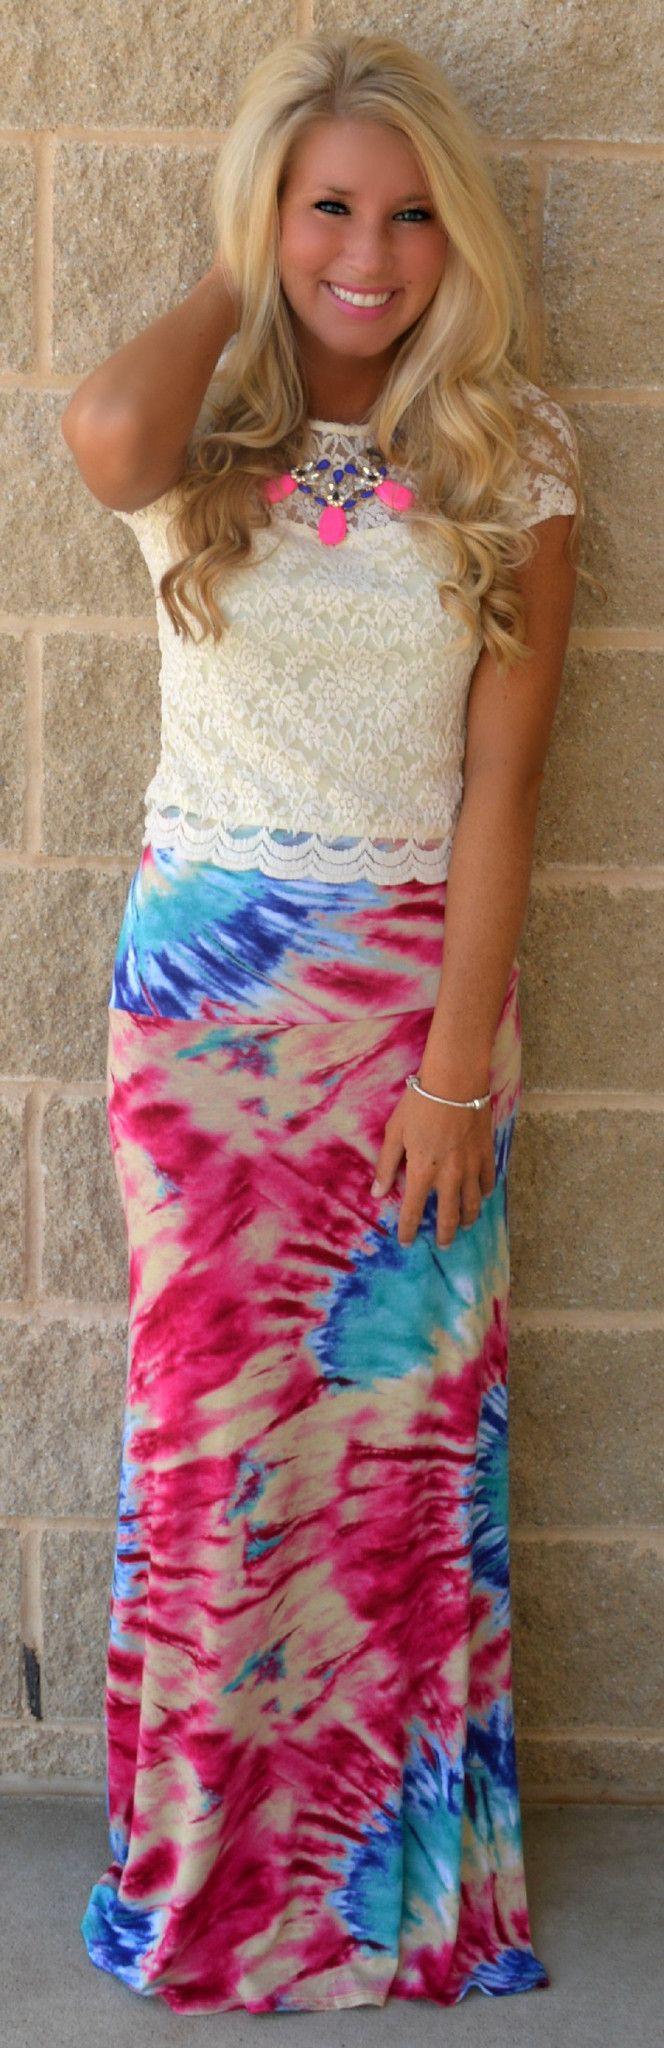 La Vida Loca Tye Dye Maxi Skirt Haute Pink Boutique